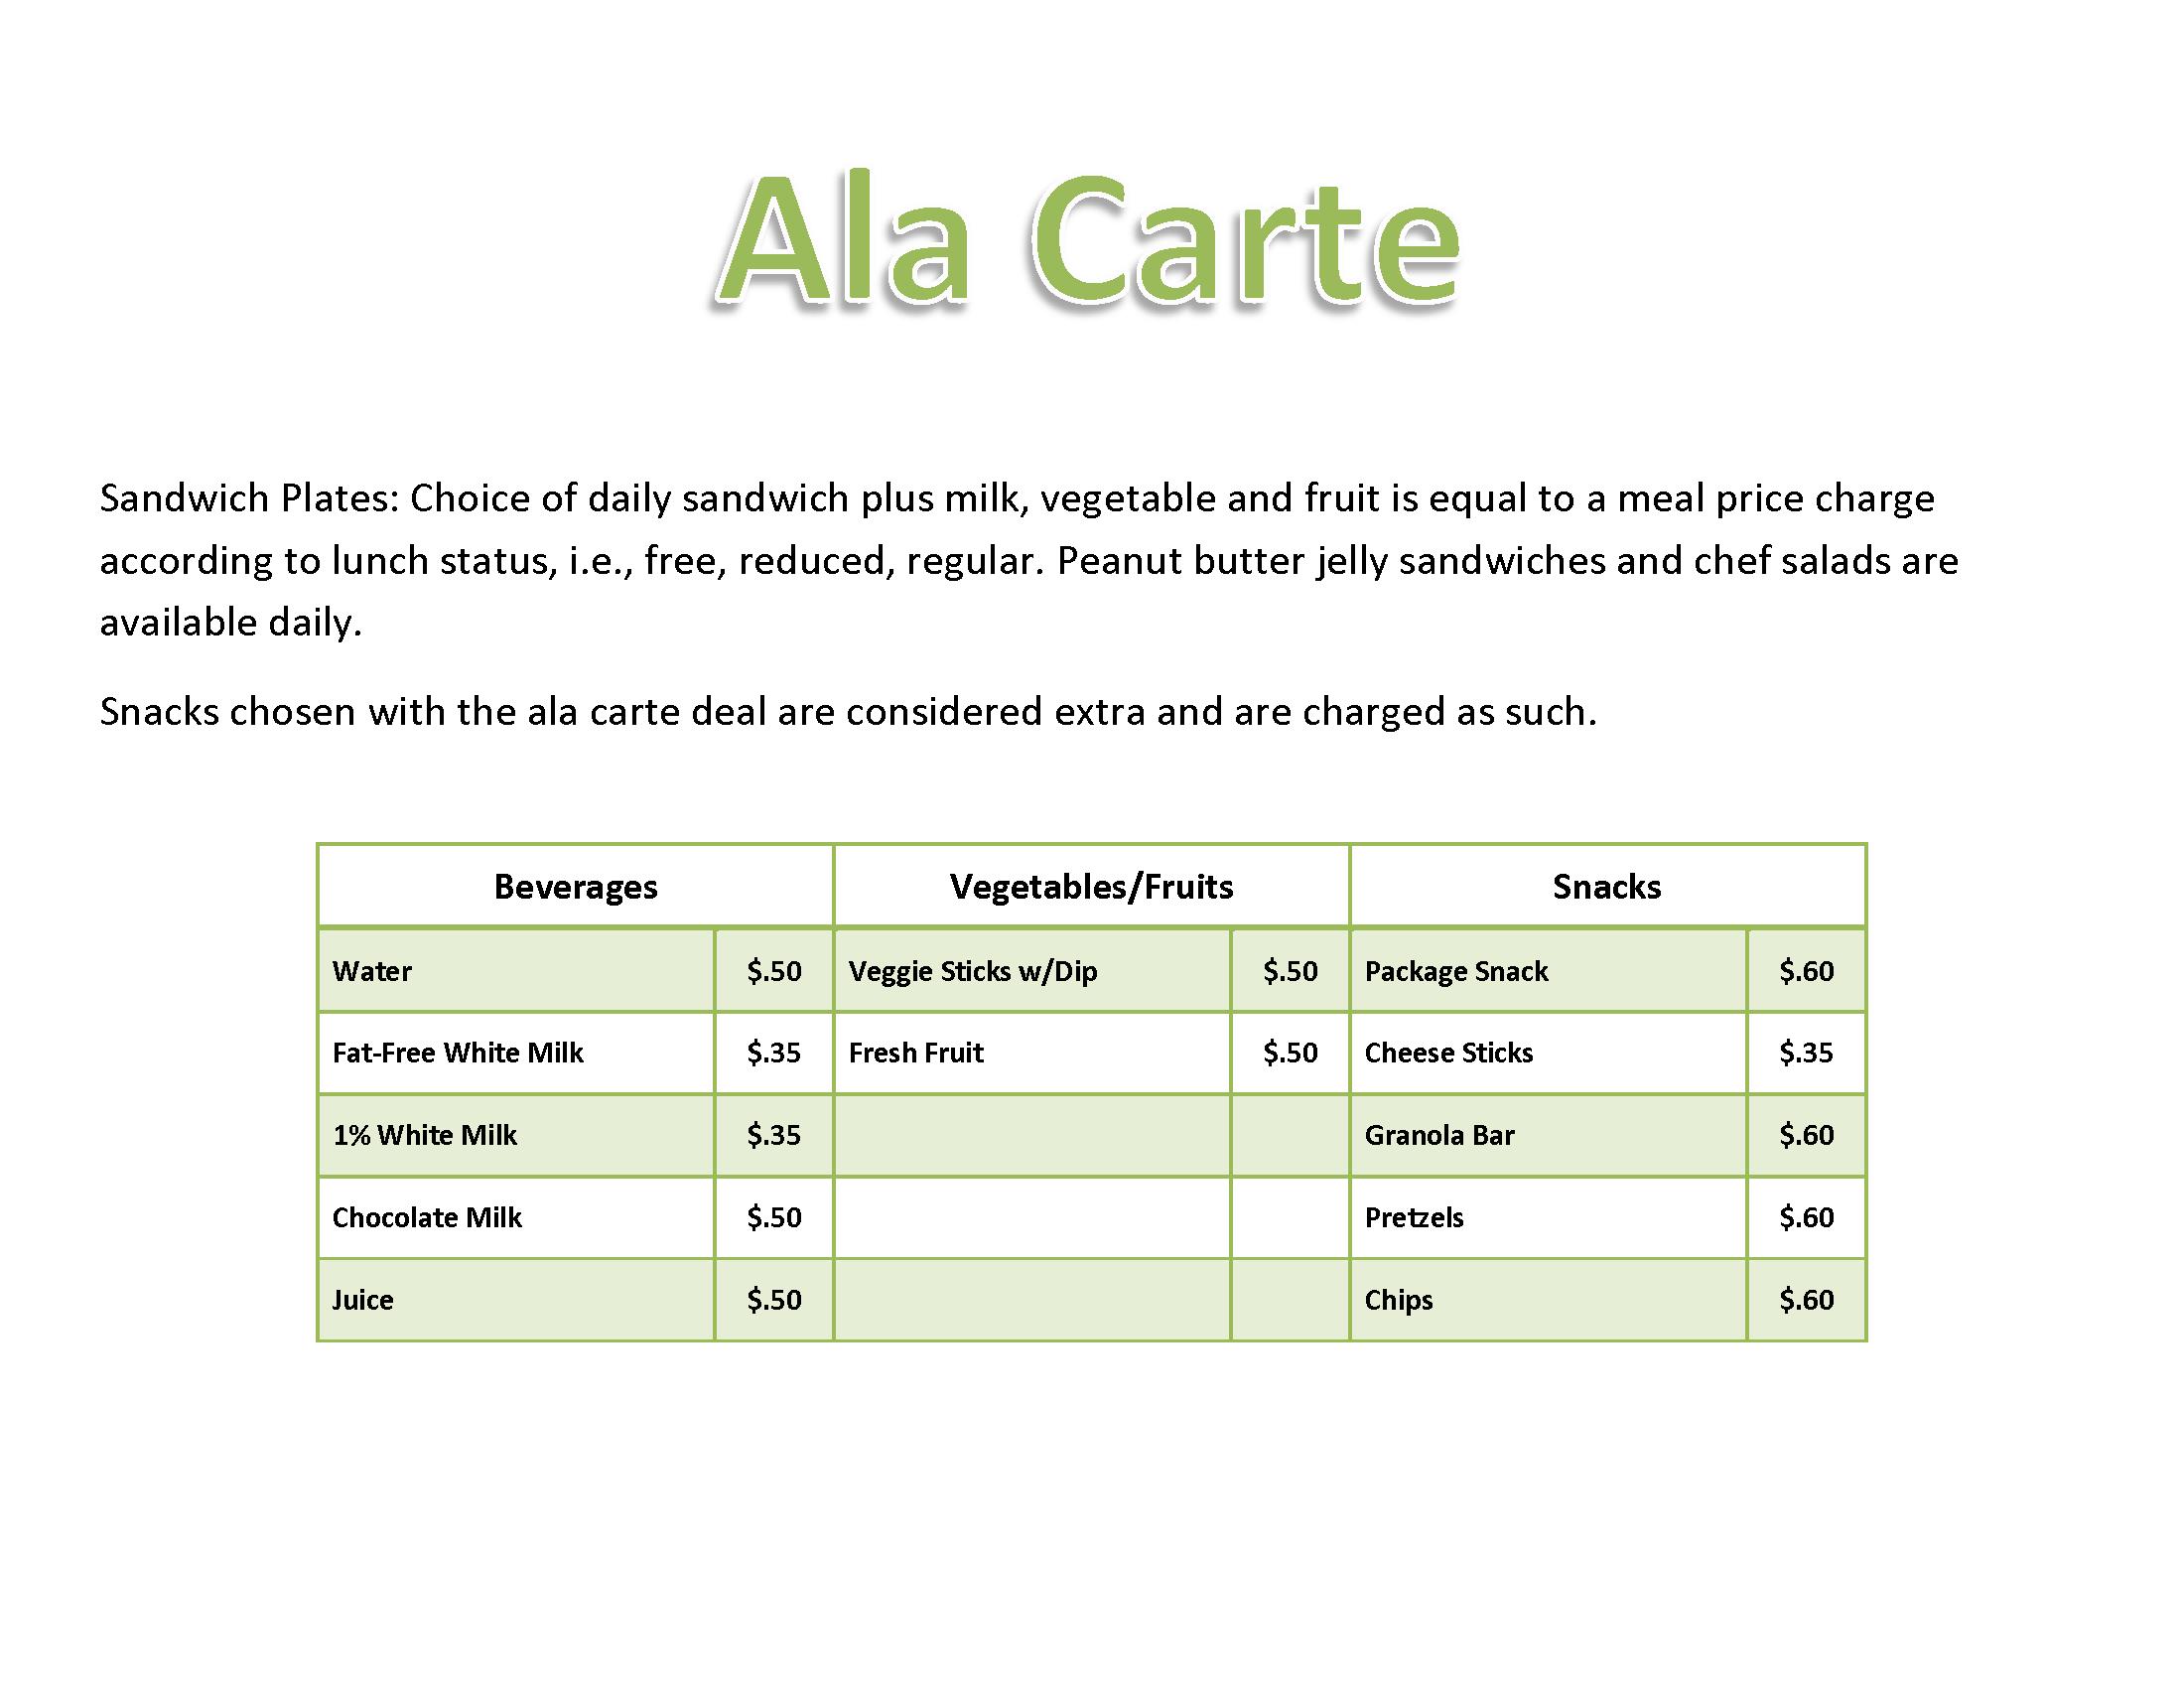 http://www2.sedomocha.org/DistrictInfo/alacartemenu.pdf